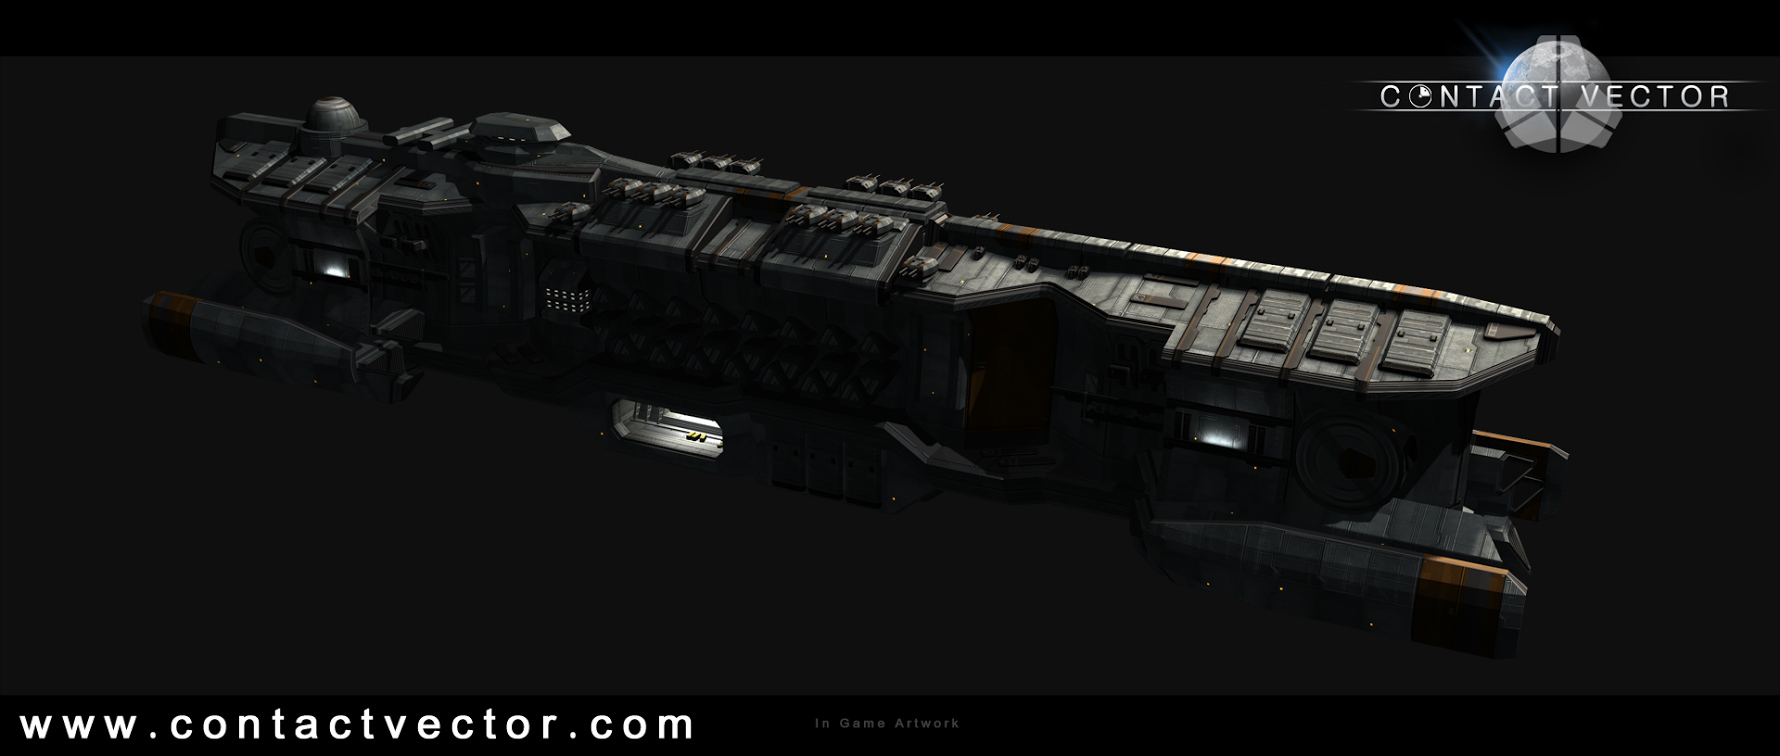 Concept Ships Concept Spaceships From Contact Vector - Spaceship design game